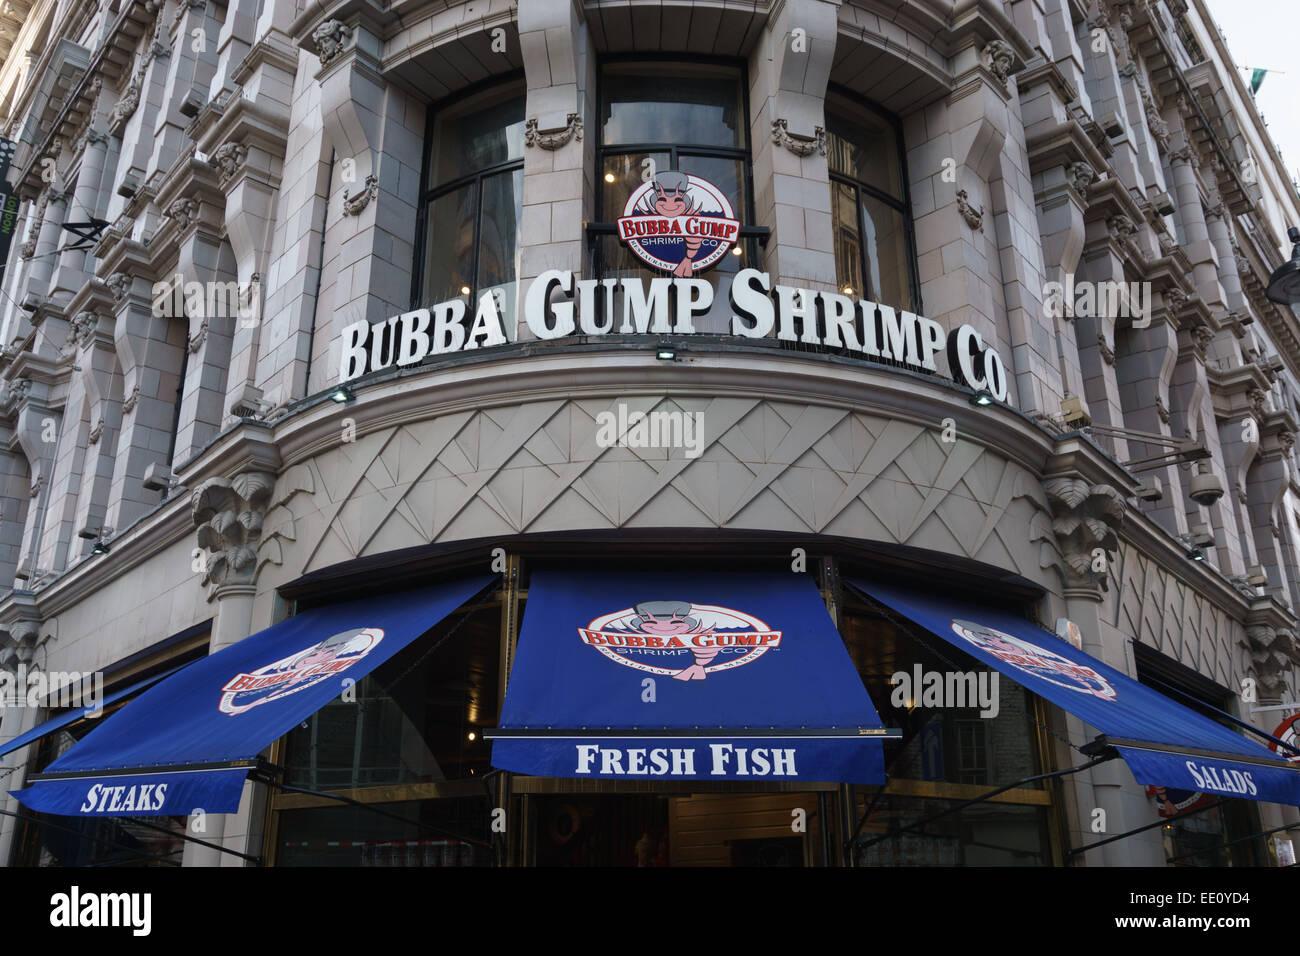 The new Bubba Gump Shrimp Co restaurant in London - Stock Image